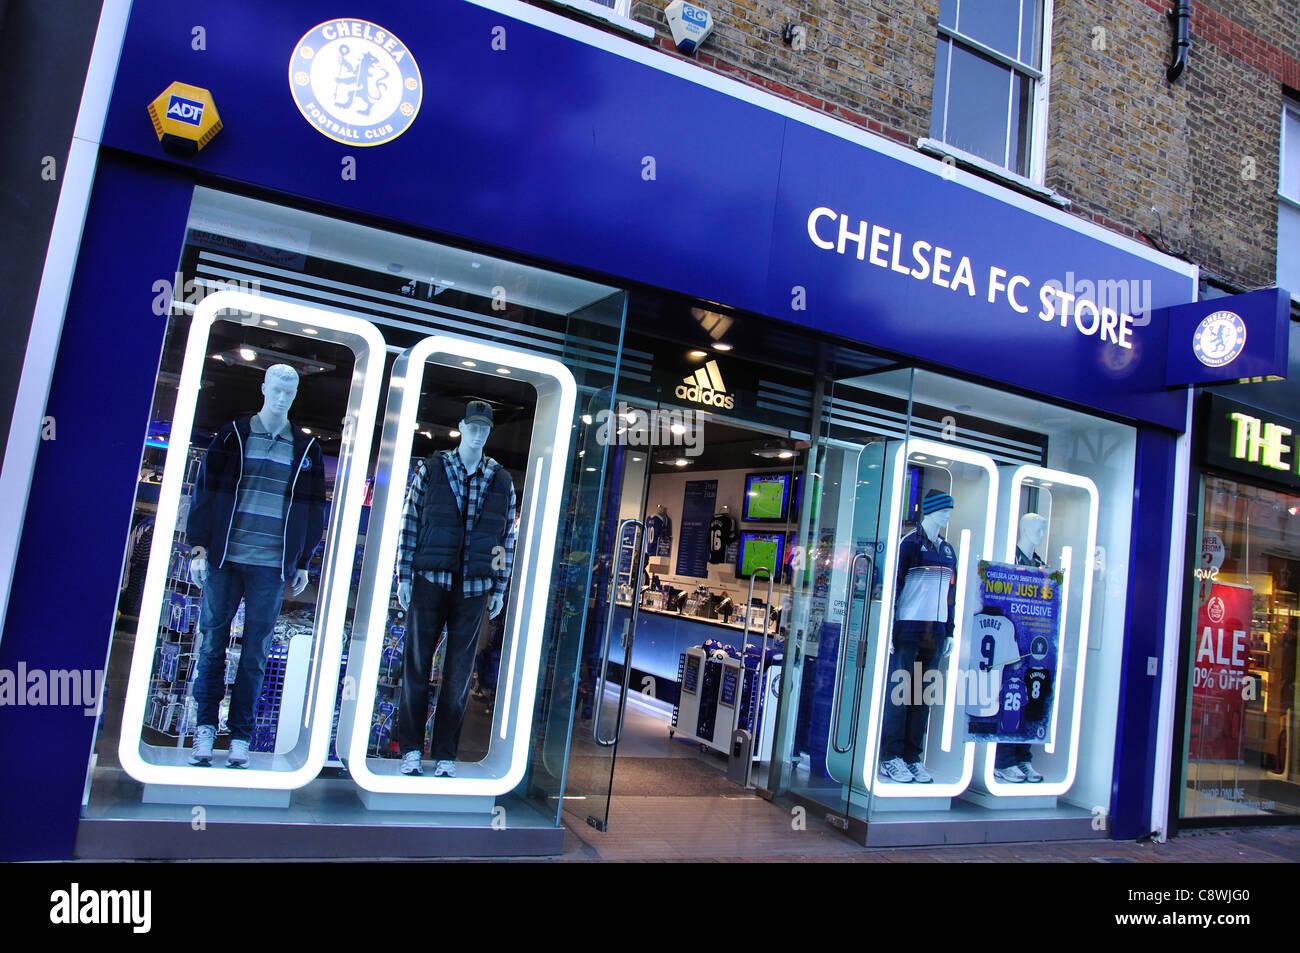 Chelsea Fc Jobs in Kingston upon Thames - October | metrseo ga